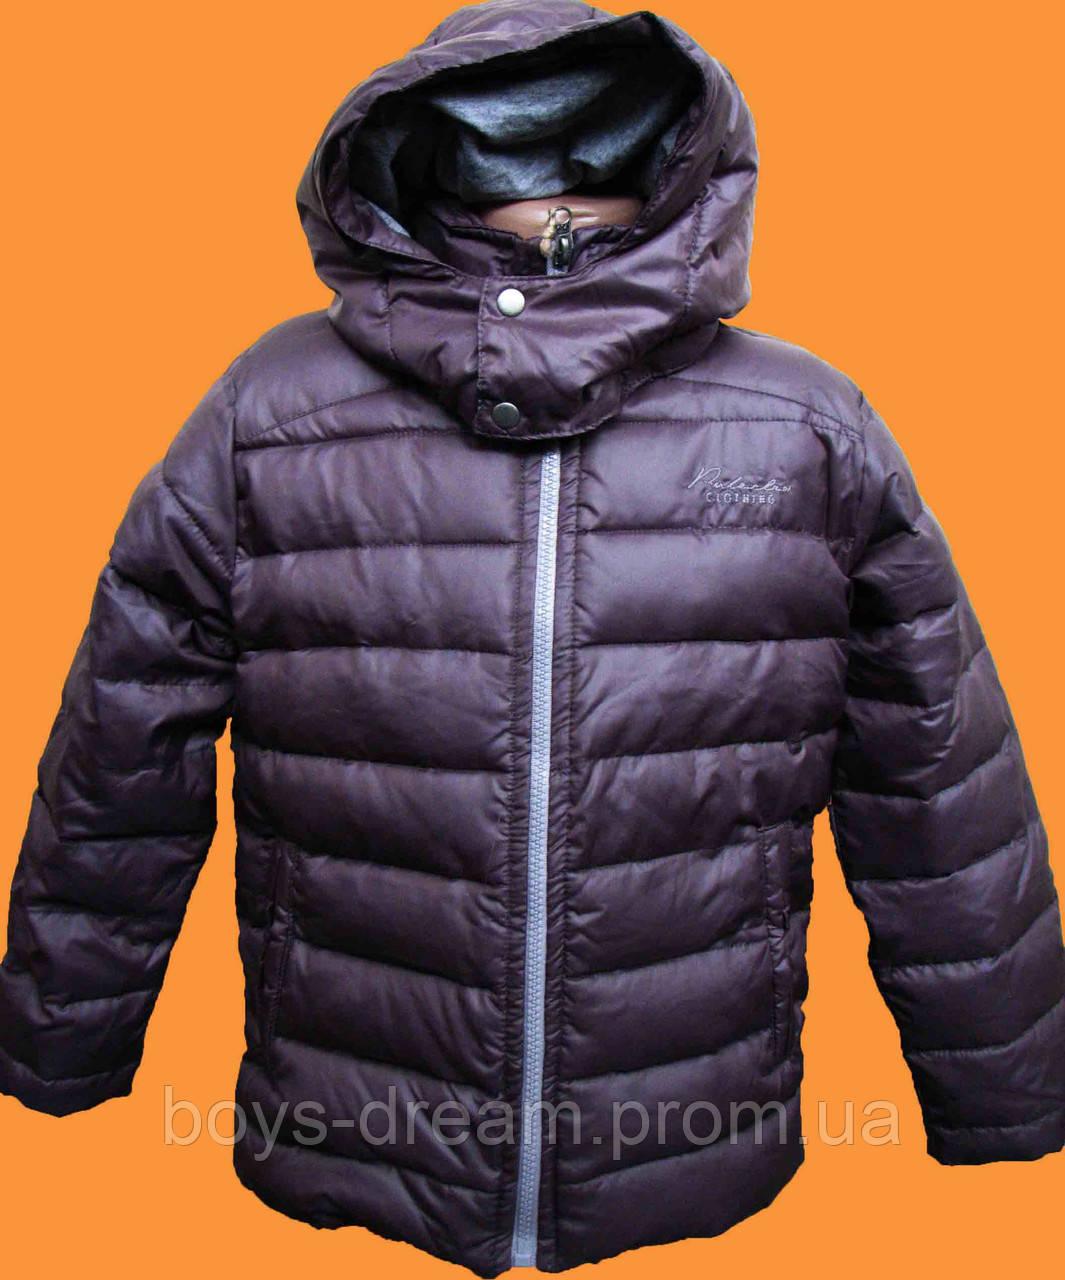 Куртка зимняя для мальчика (92-134) Puledro (Турция)